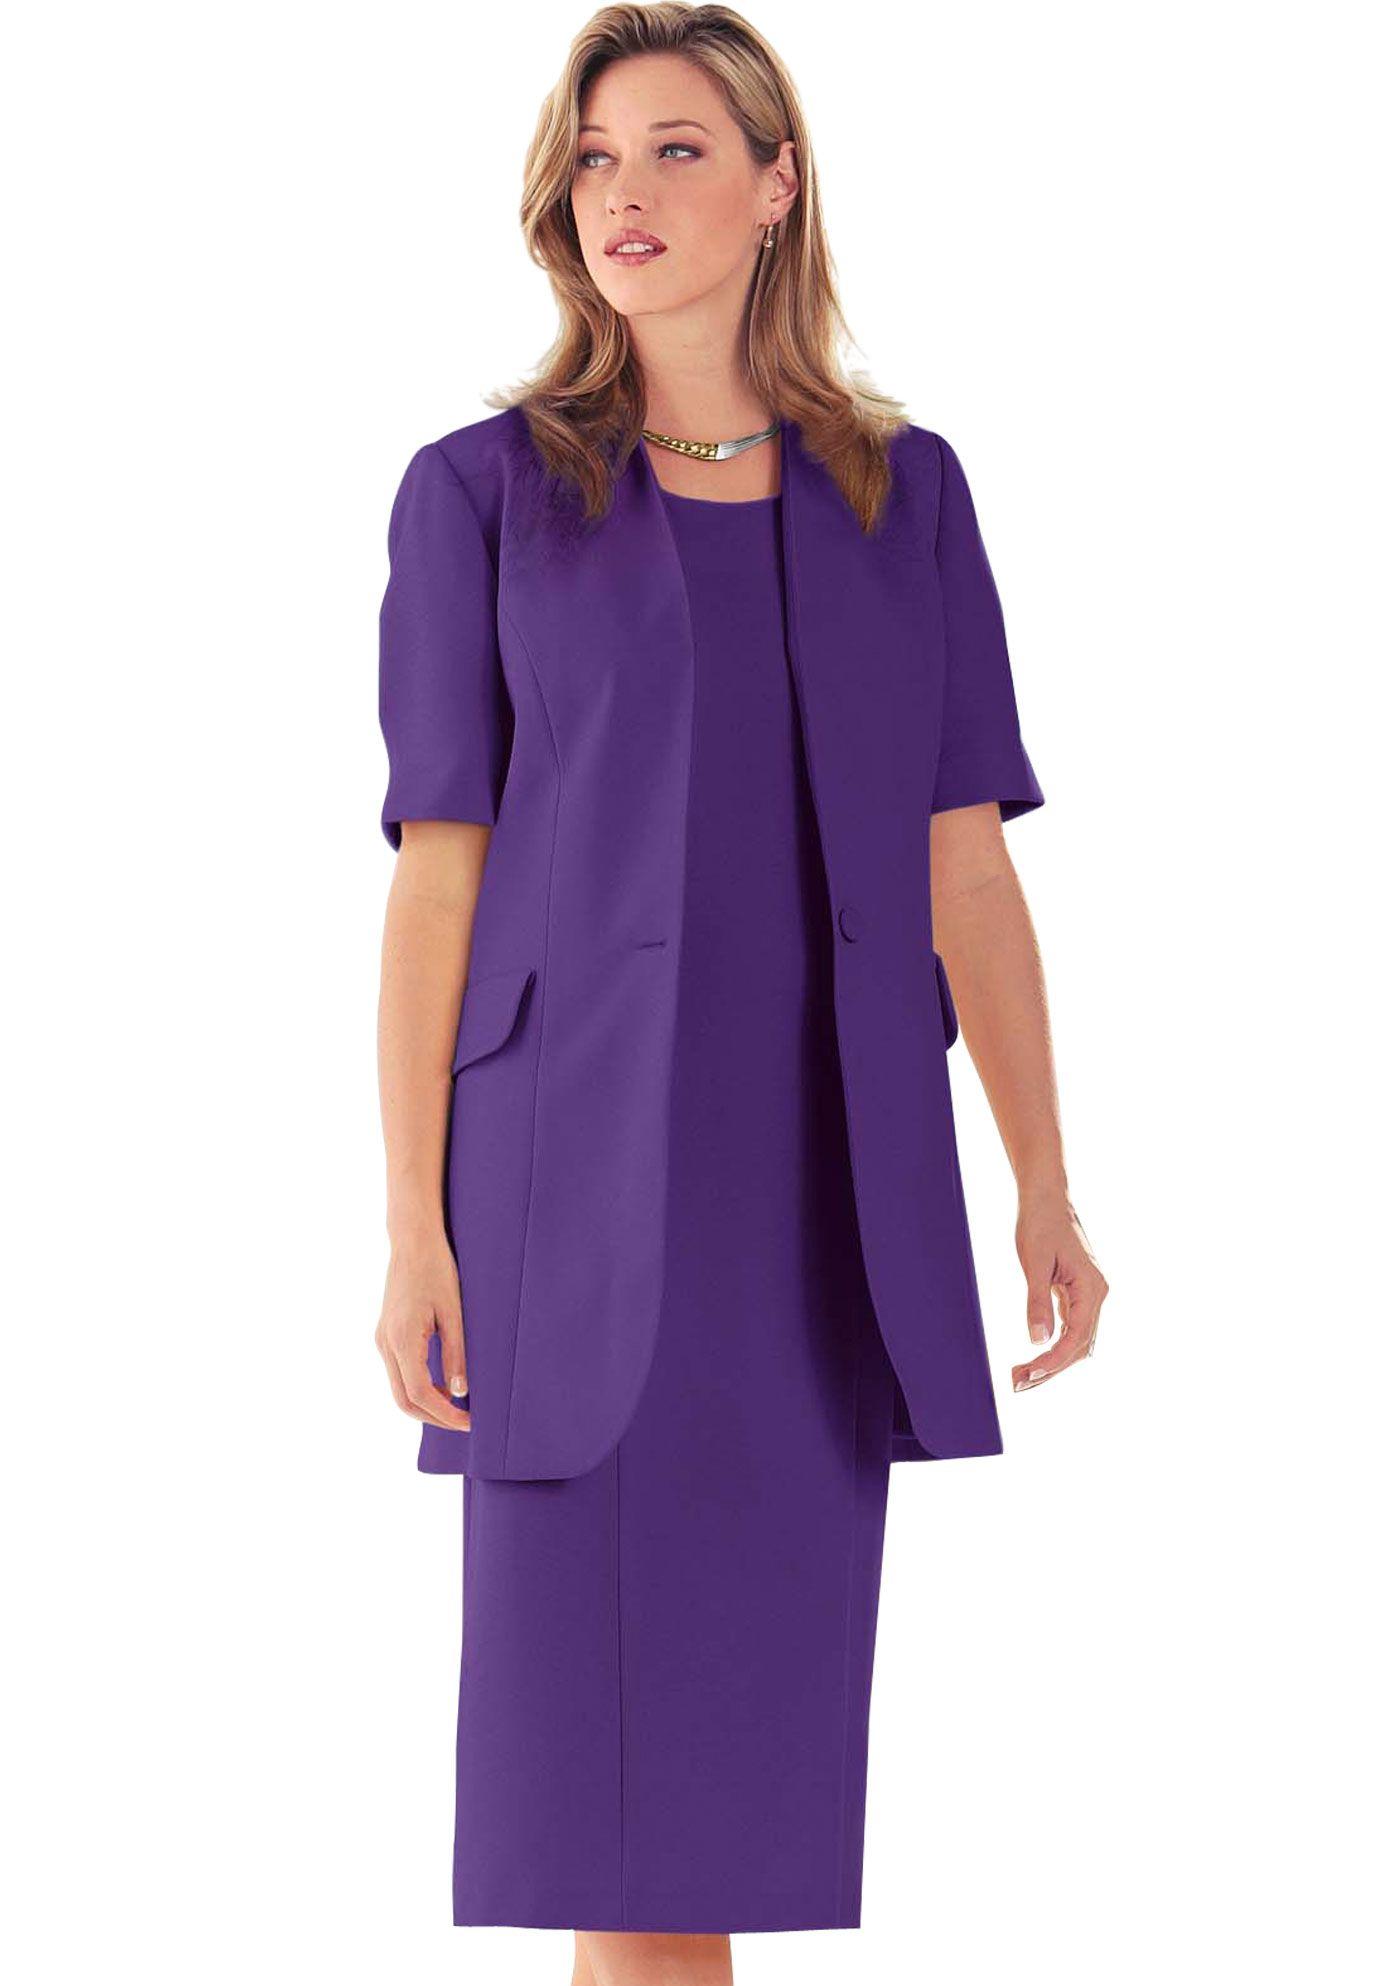 Short Sleeve Sheath Jacket Dress Plus Size Career Dresses